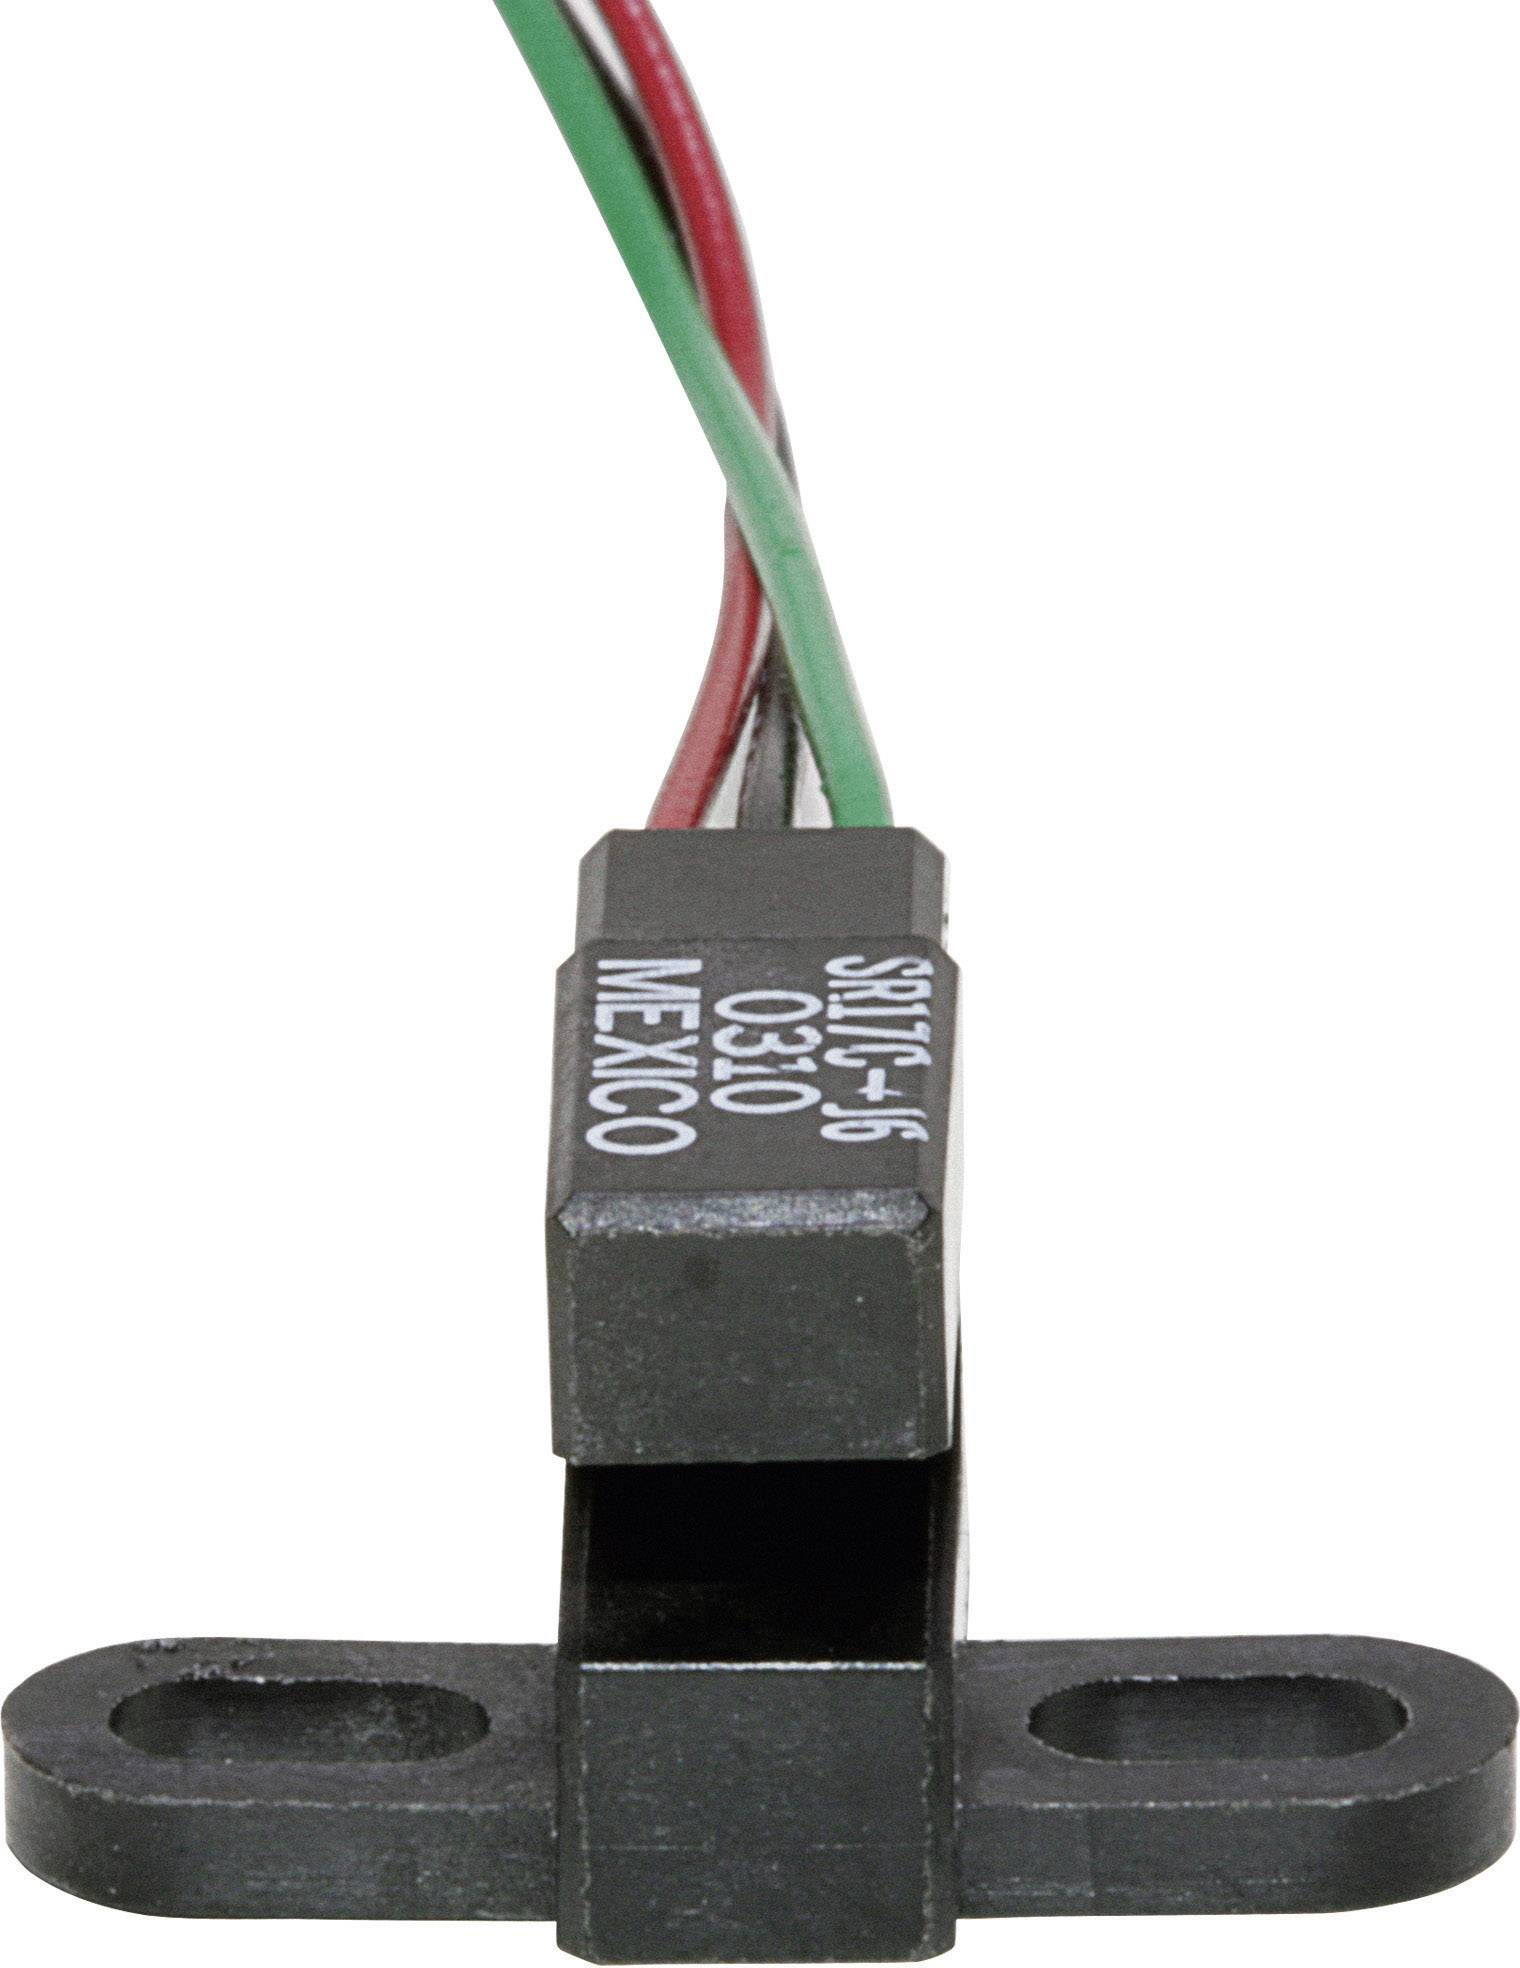 Kombinovaný hallův senzor Honeywell SR17C-J6, 3,8 - 30 V/DC